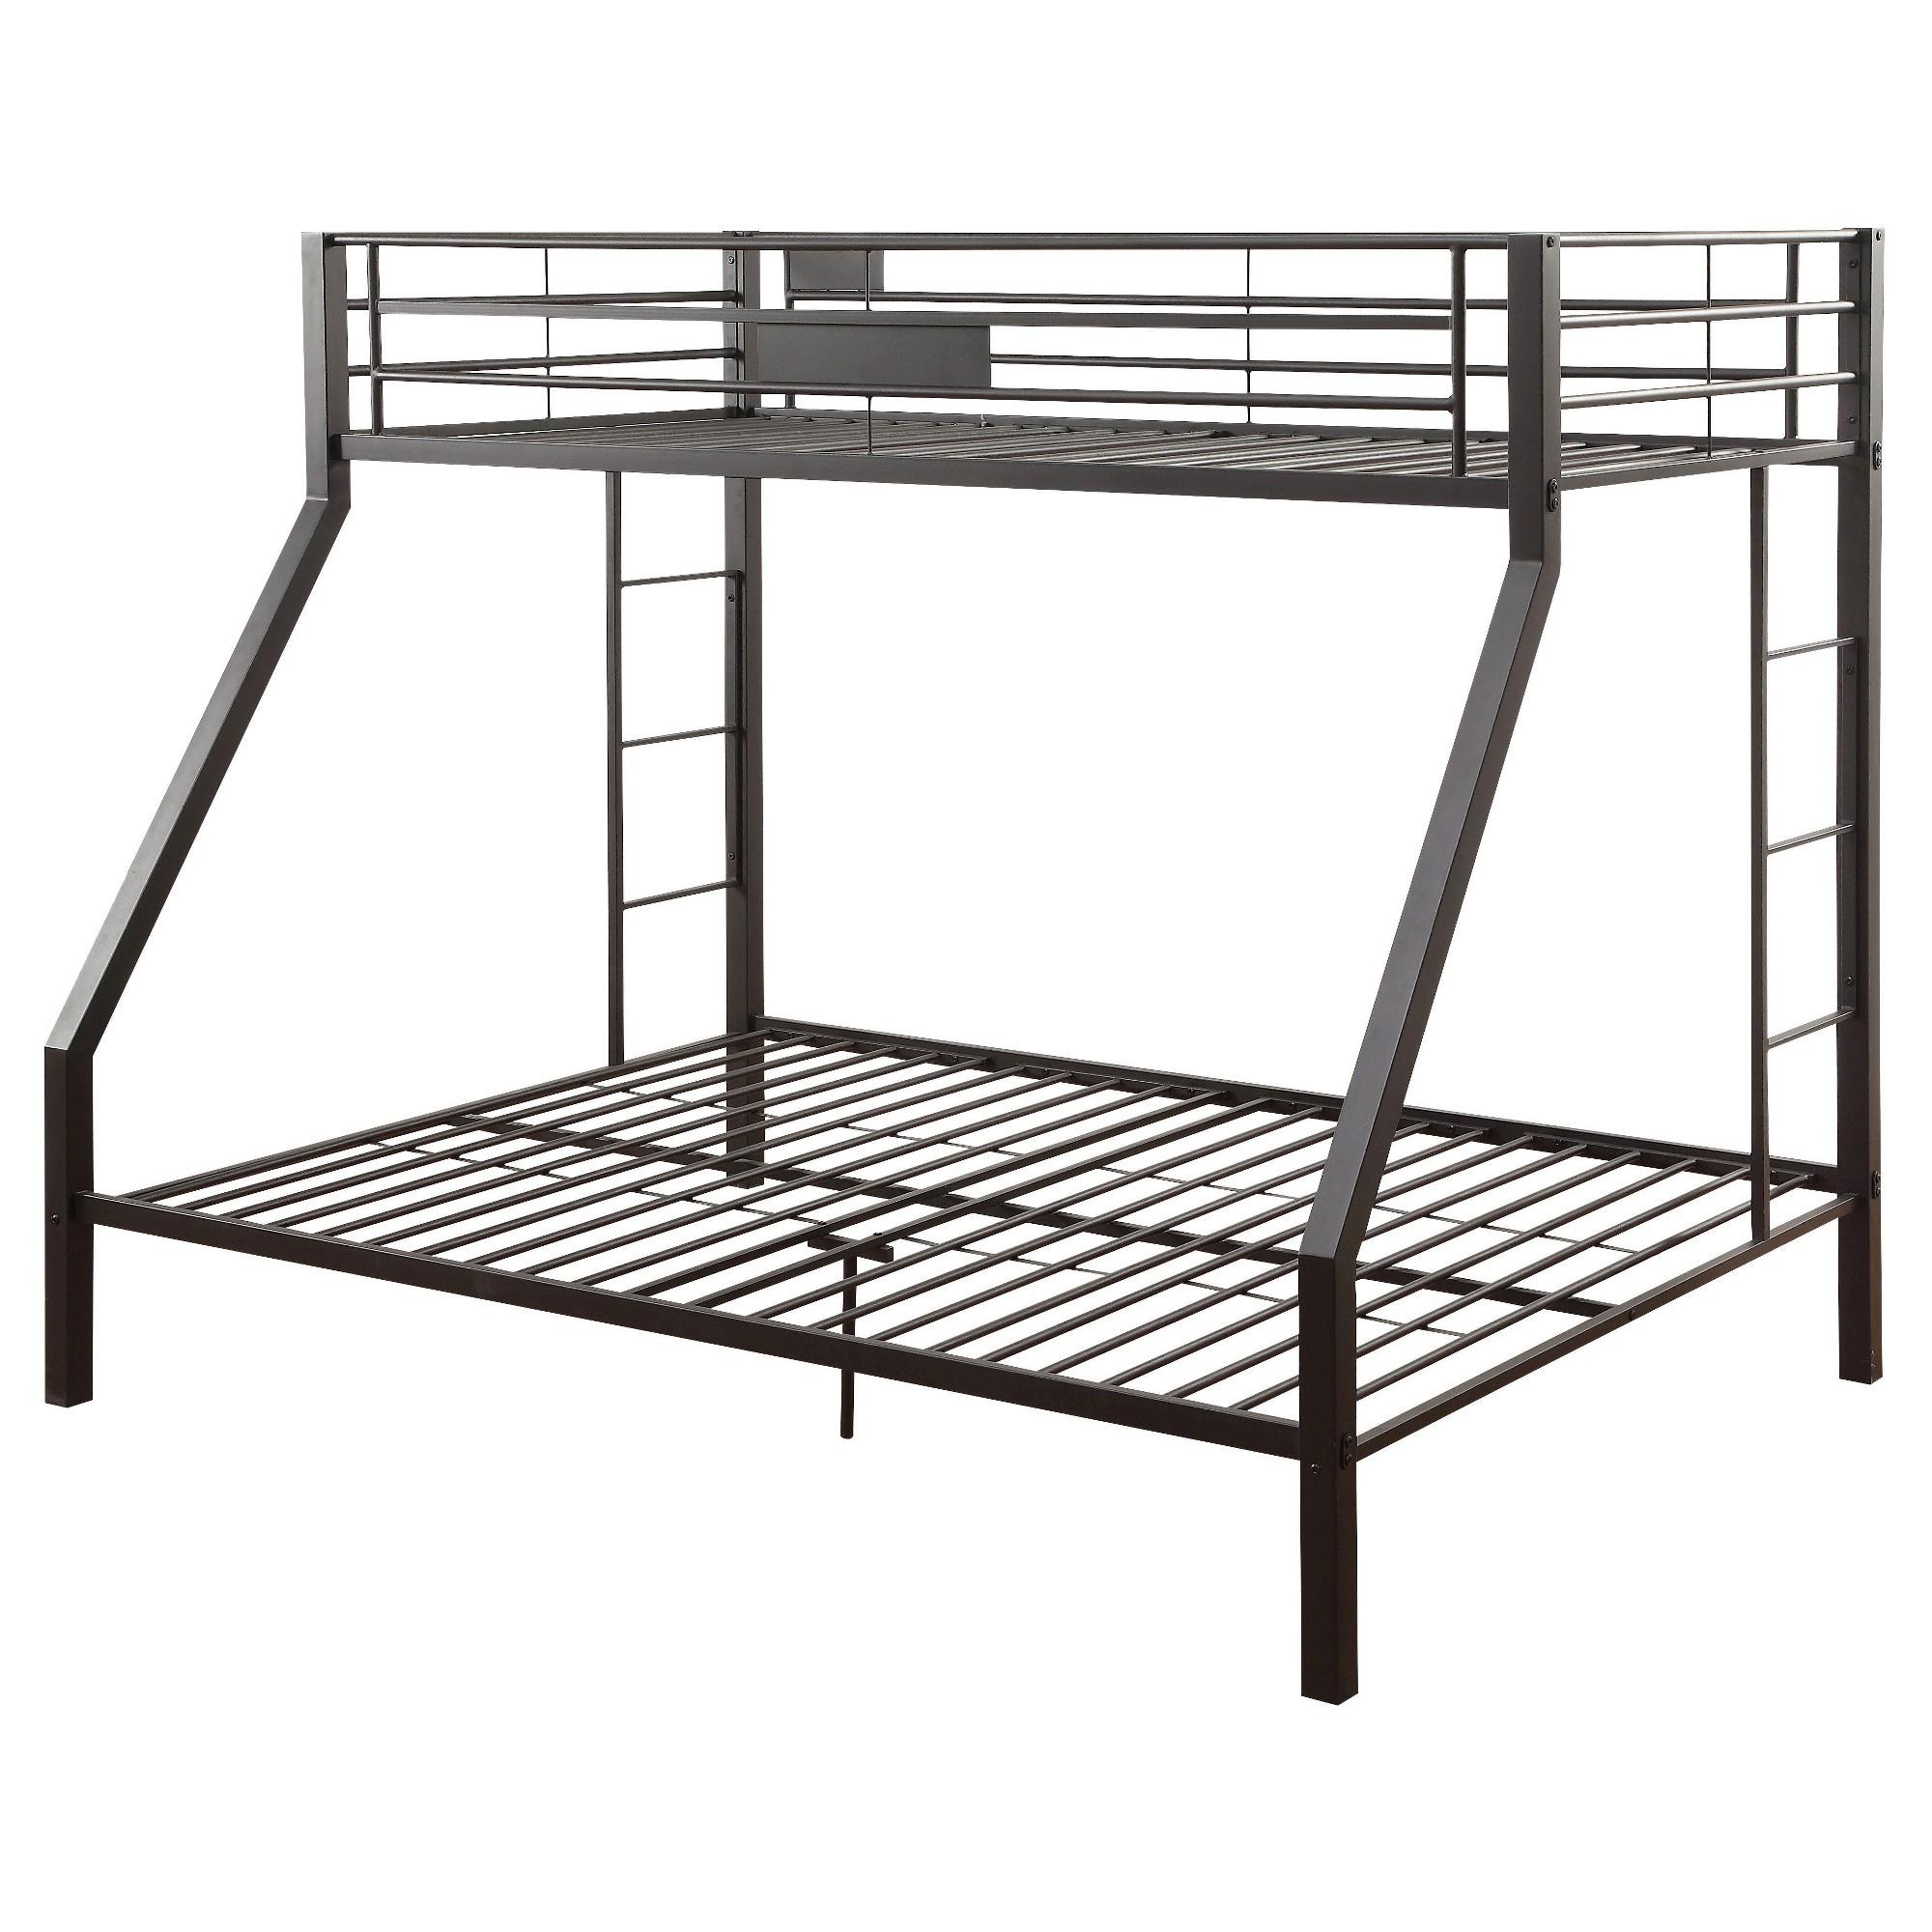 Limbra Kids Bunk Bed - Black Sand(Twin XL/Queen) - Acme